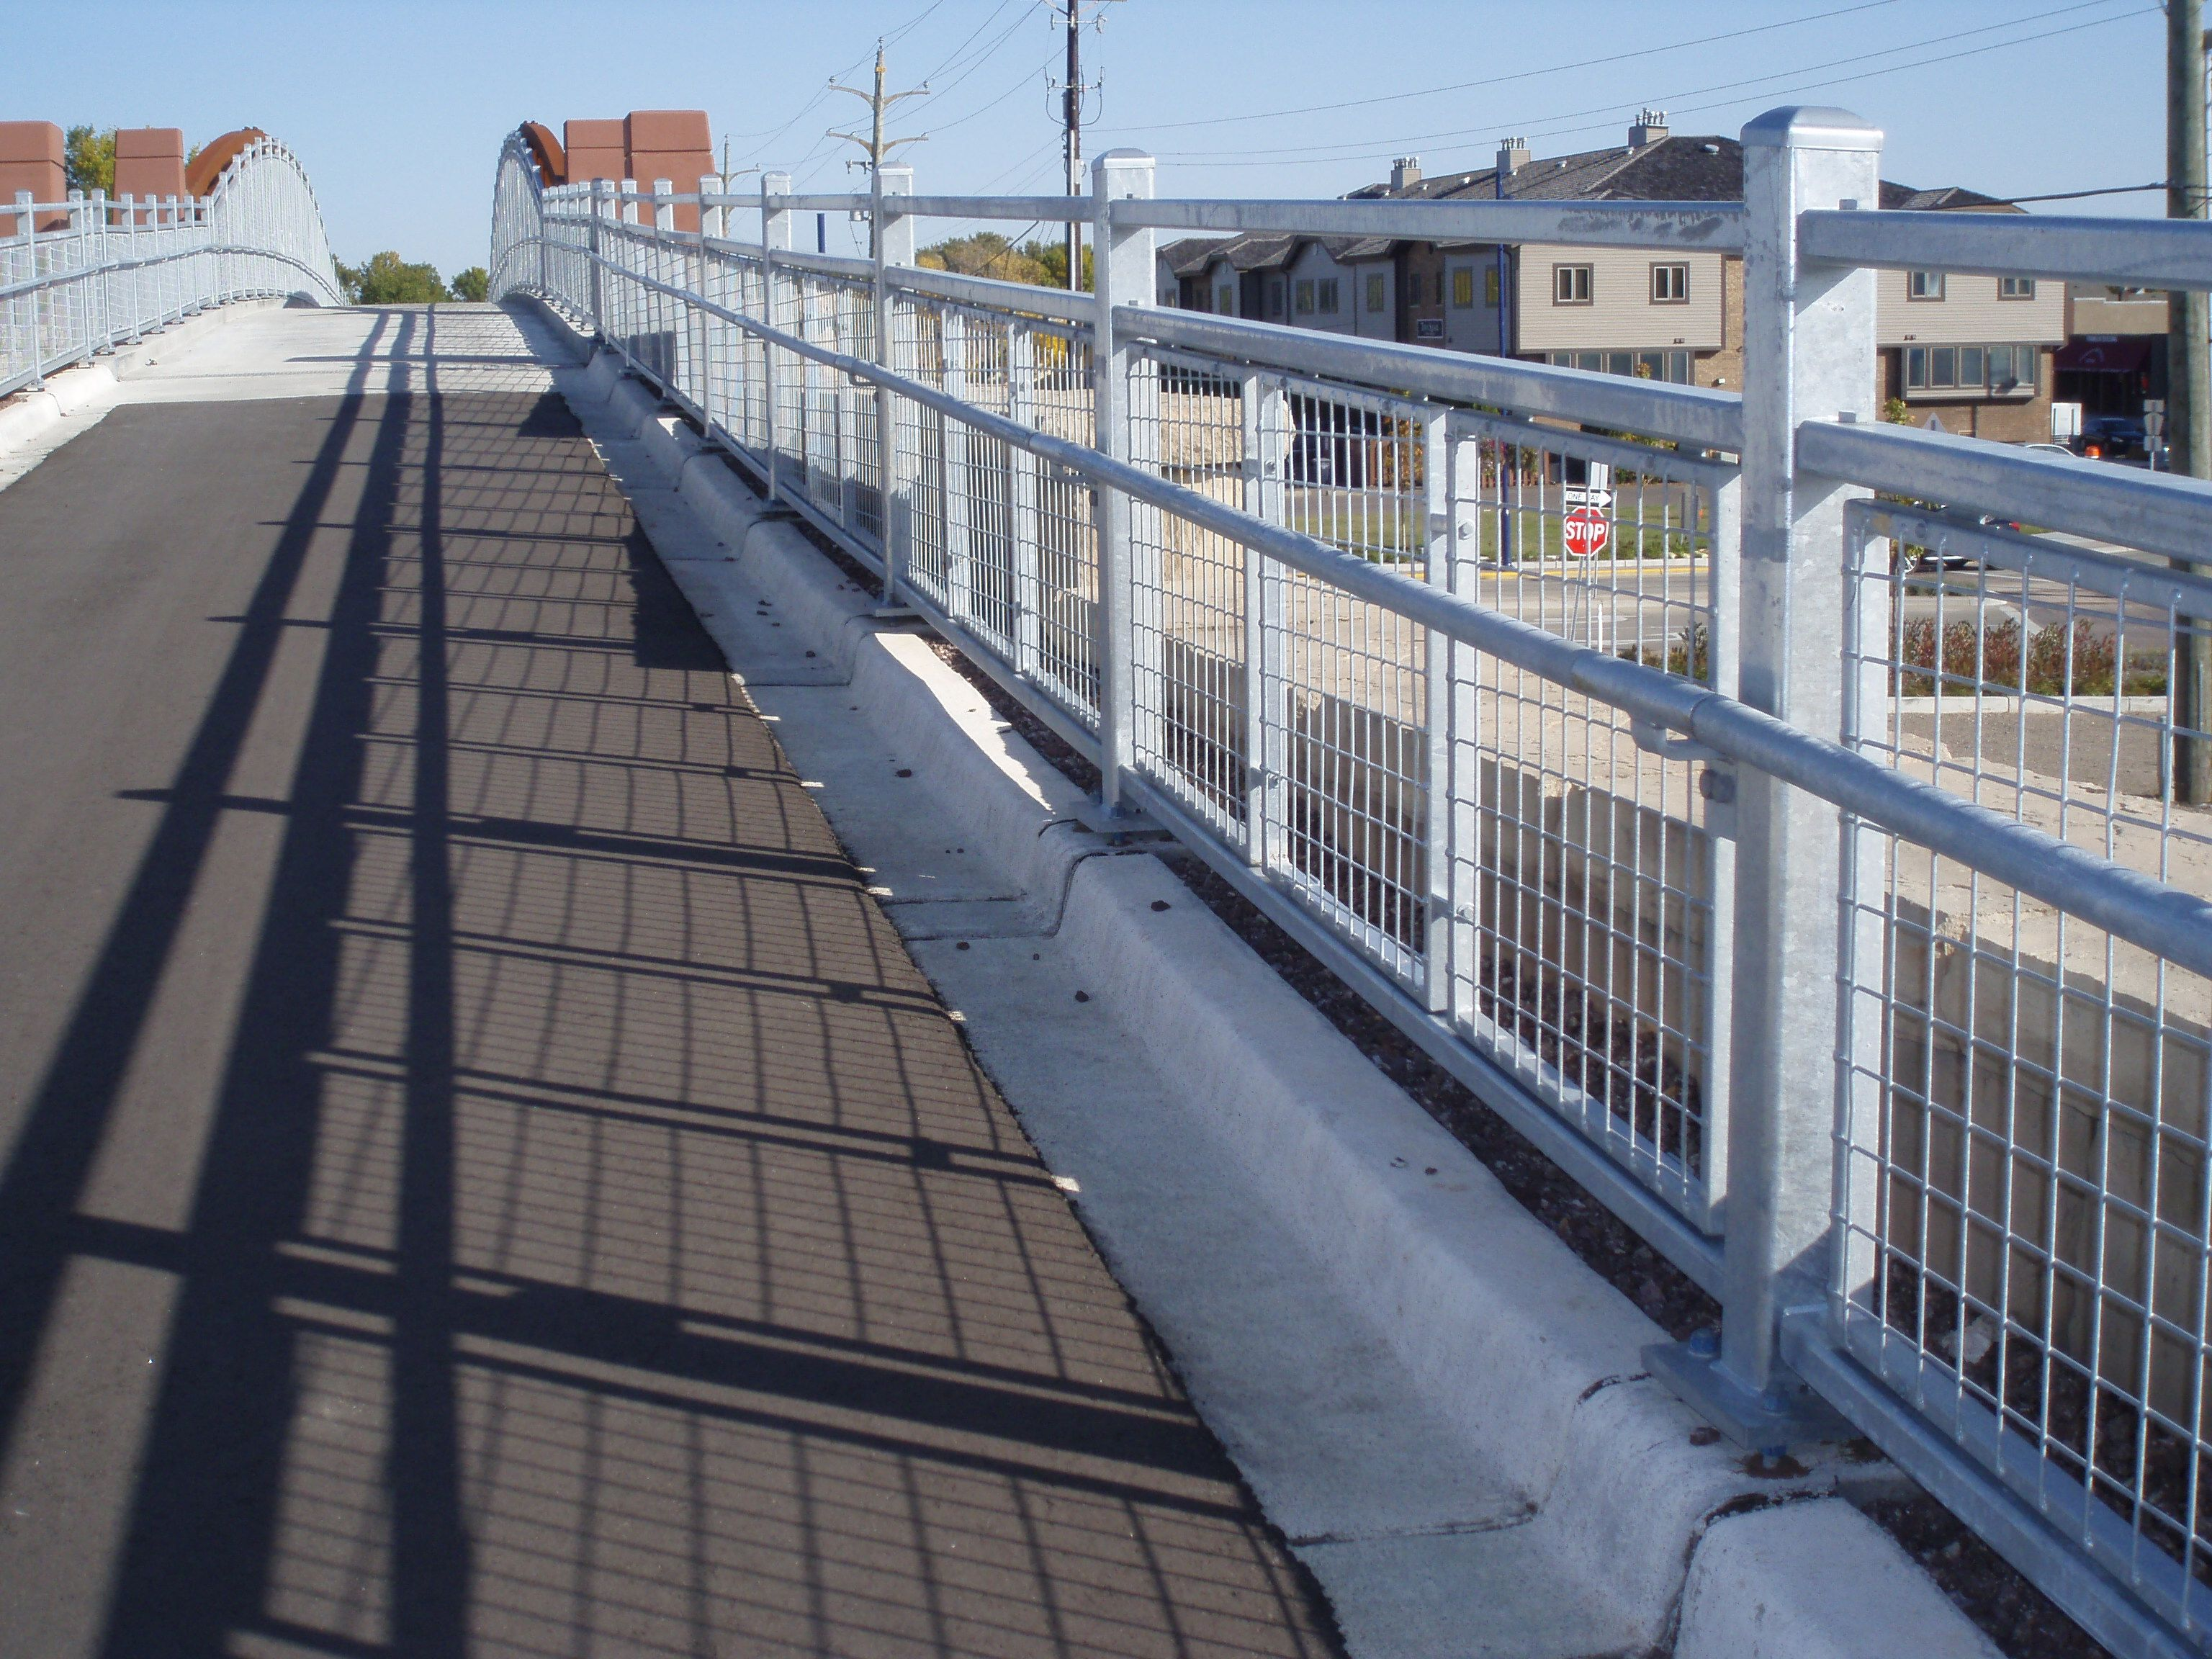 Galvanized steel railing on a pedestrian bridge By Astro ...